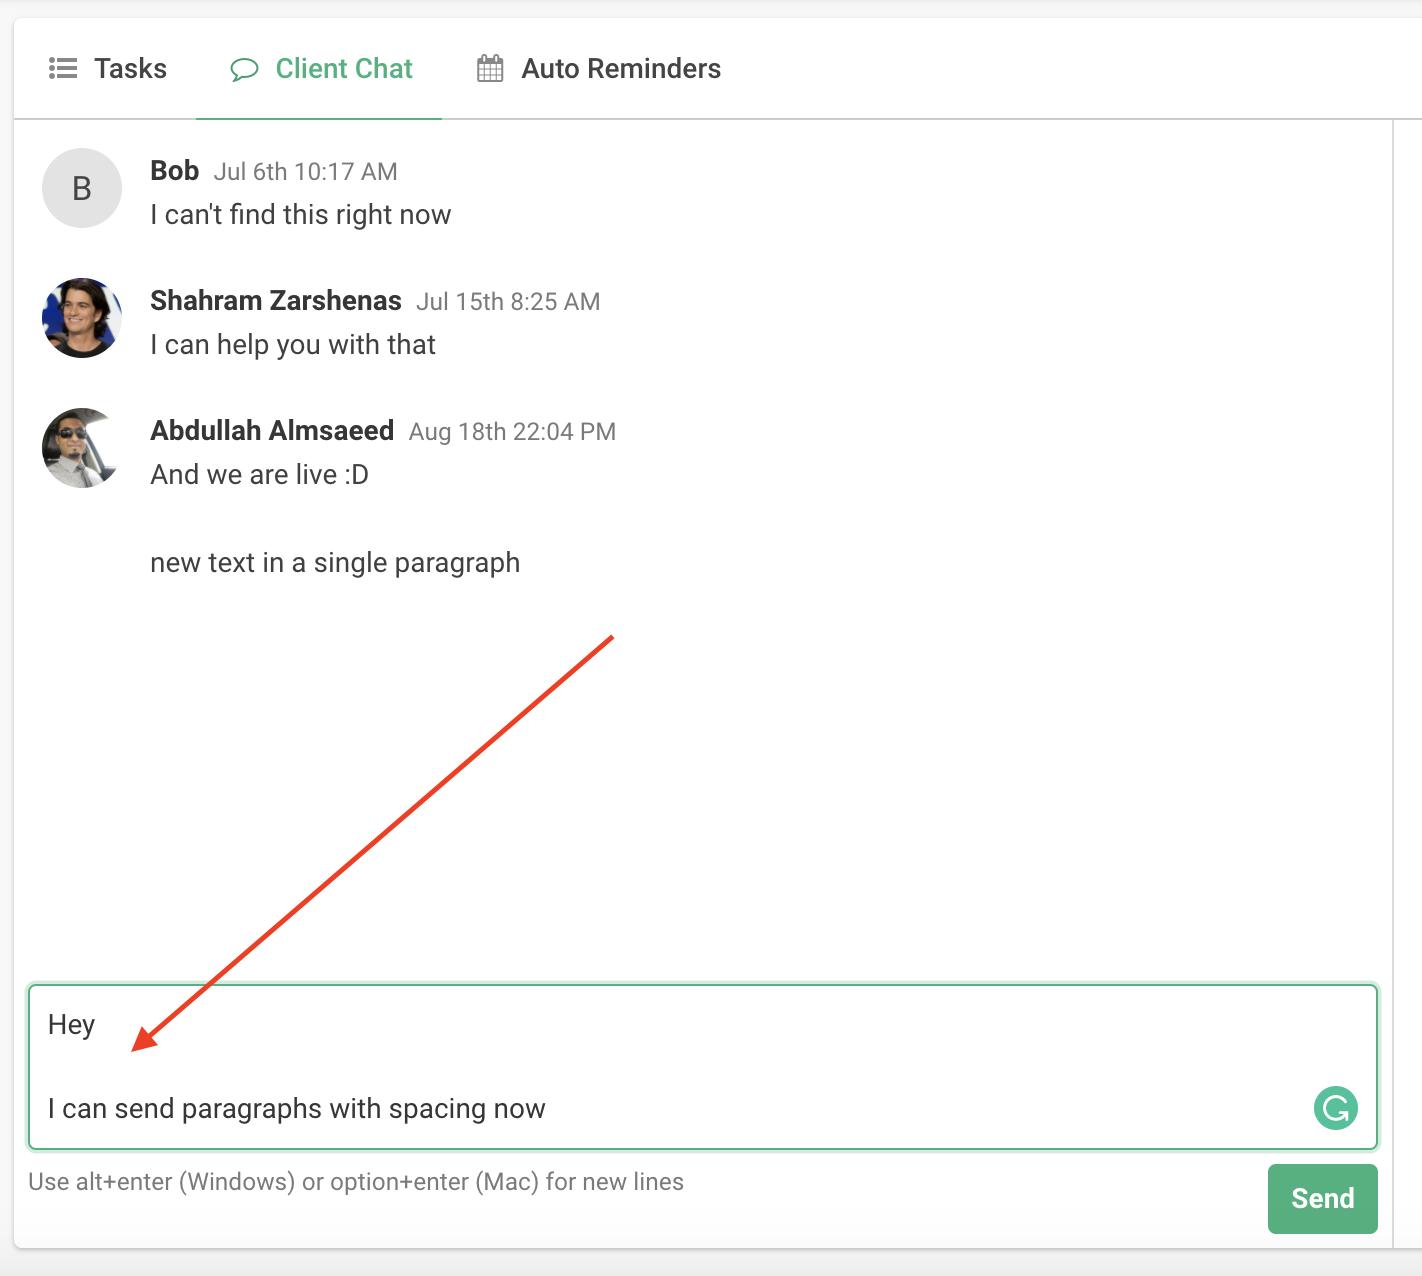 Client Task Updates 3